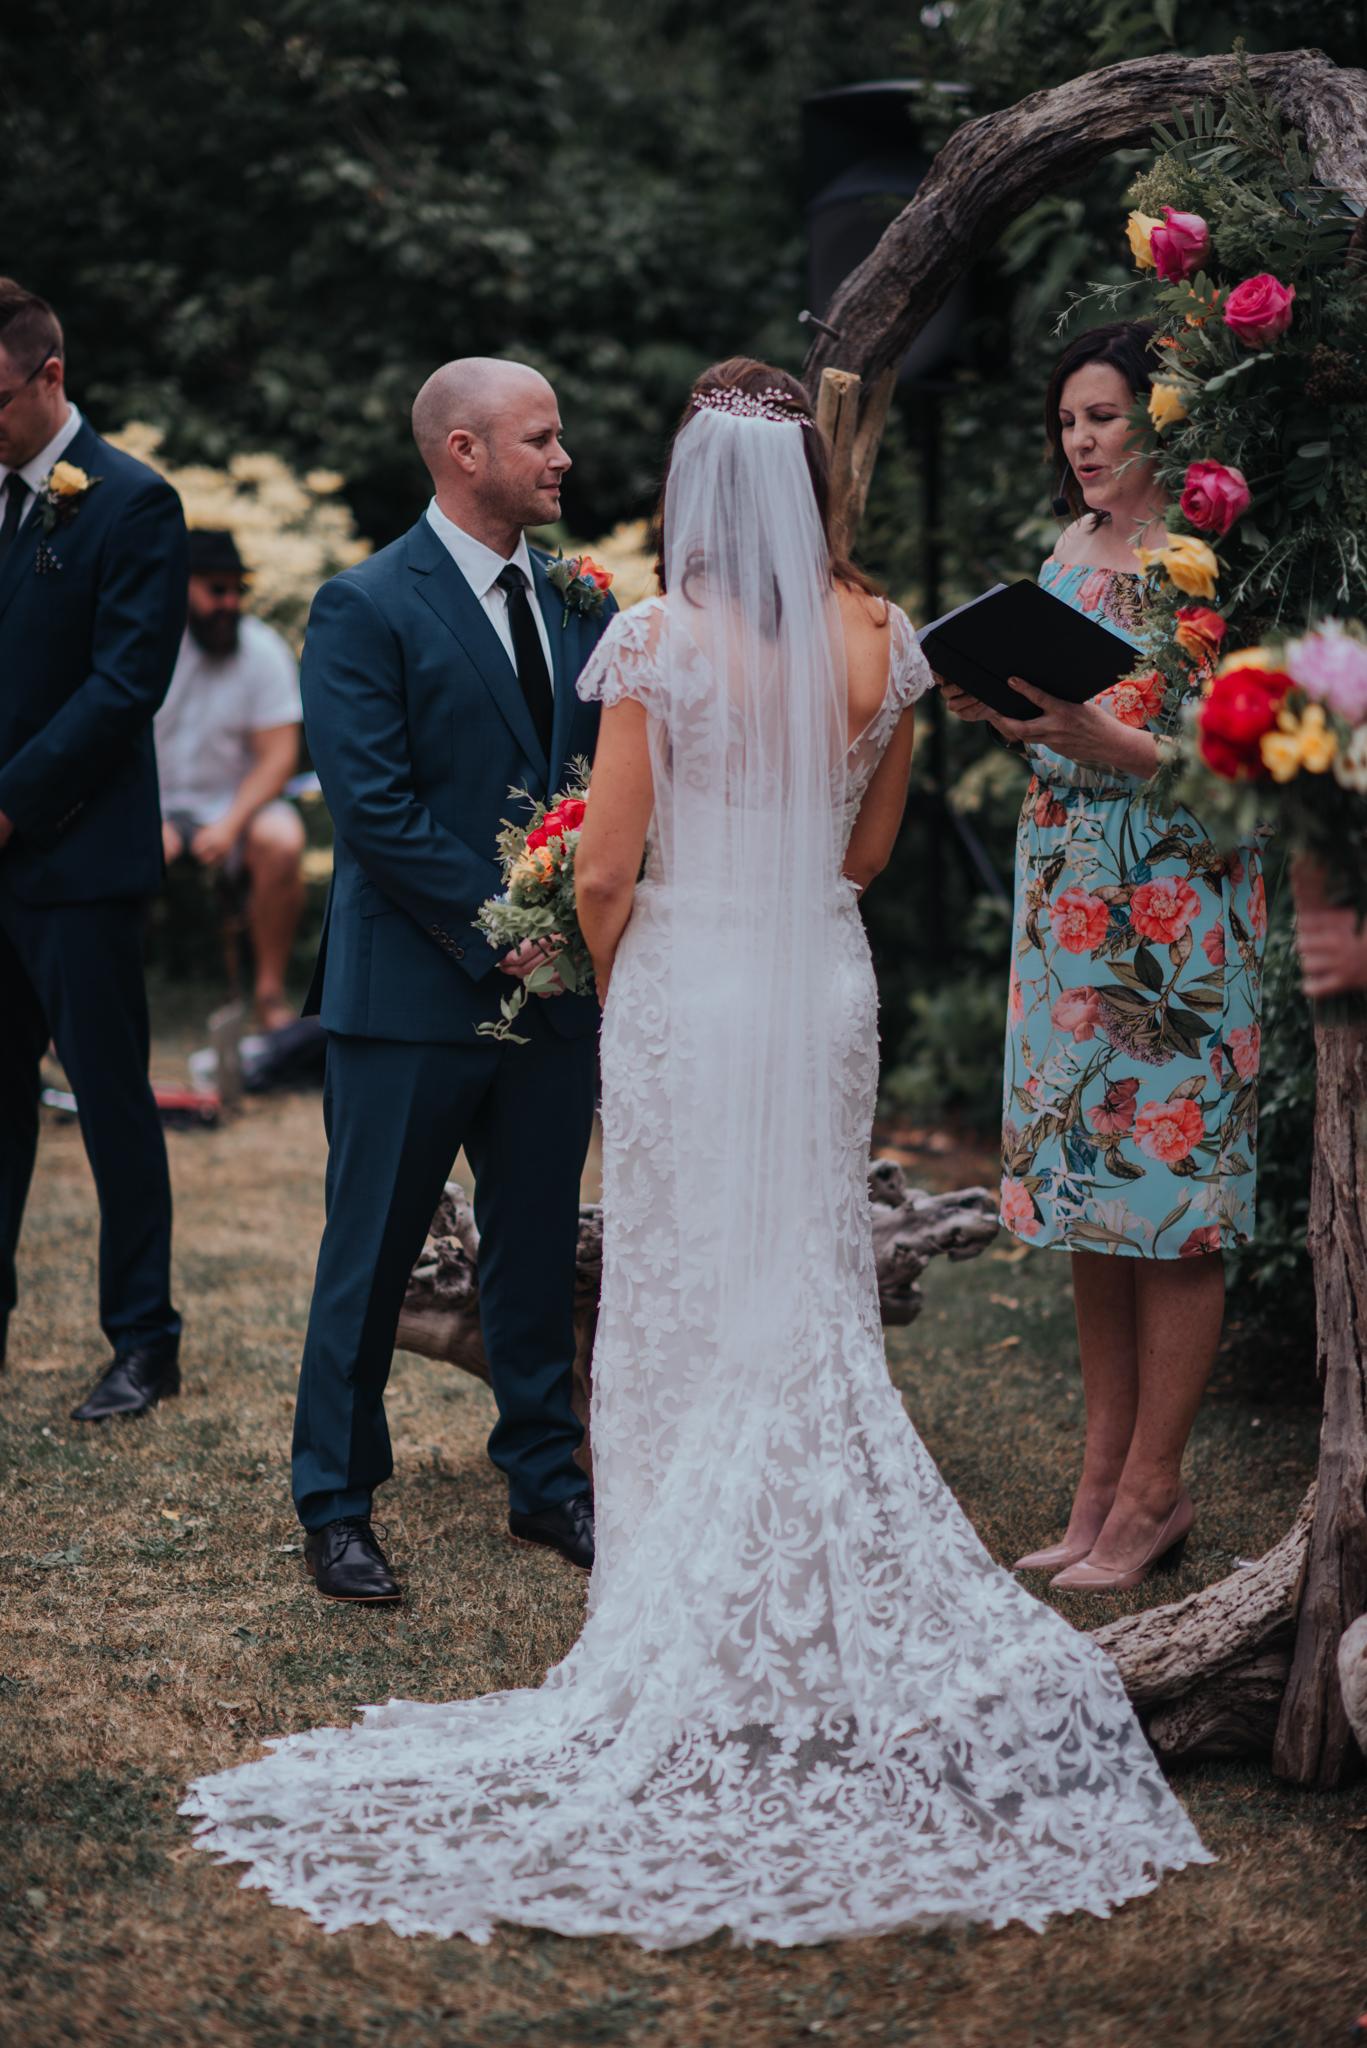 LOVELENSCAPES PHOTOGRAPHY • VISUAL POETRY • NEW ZEALAND WEDDING PHOTOGRAPHER • AUSTRALIAN WEDDING PHOTOGRAPHER • BRISBANE • MELBOURNE • SYDNEY • HOBART • TARUREKA ESTATE • ANNA CAMPBELL • 111.jpg